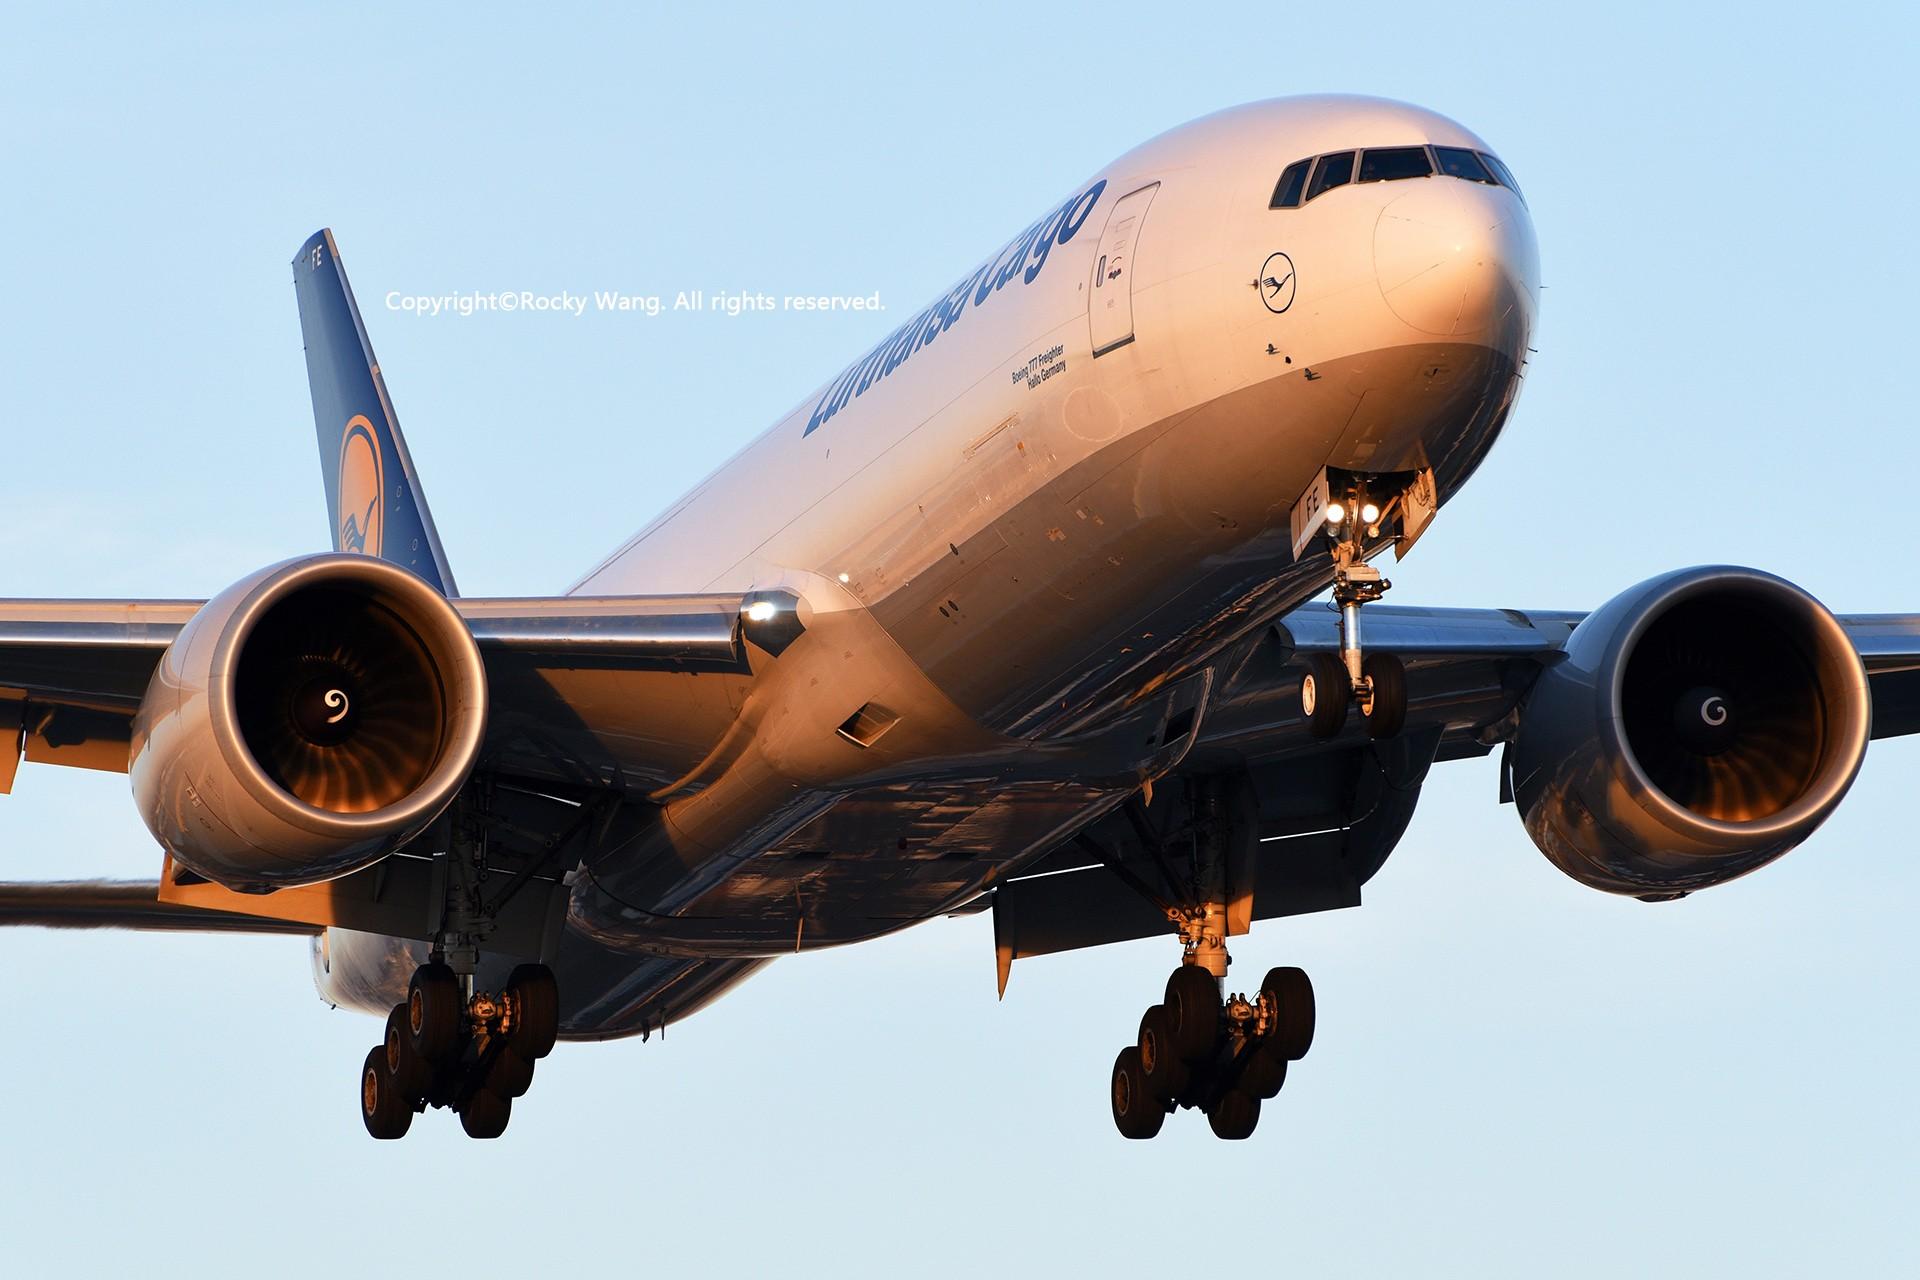 Re:[原创]CYYZ 30图 BOEING 777-FBT D-ALFE Toronto Lester B. Pearson Int'l Airport